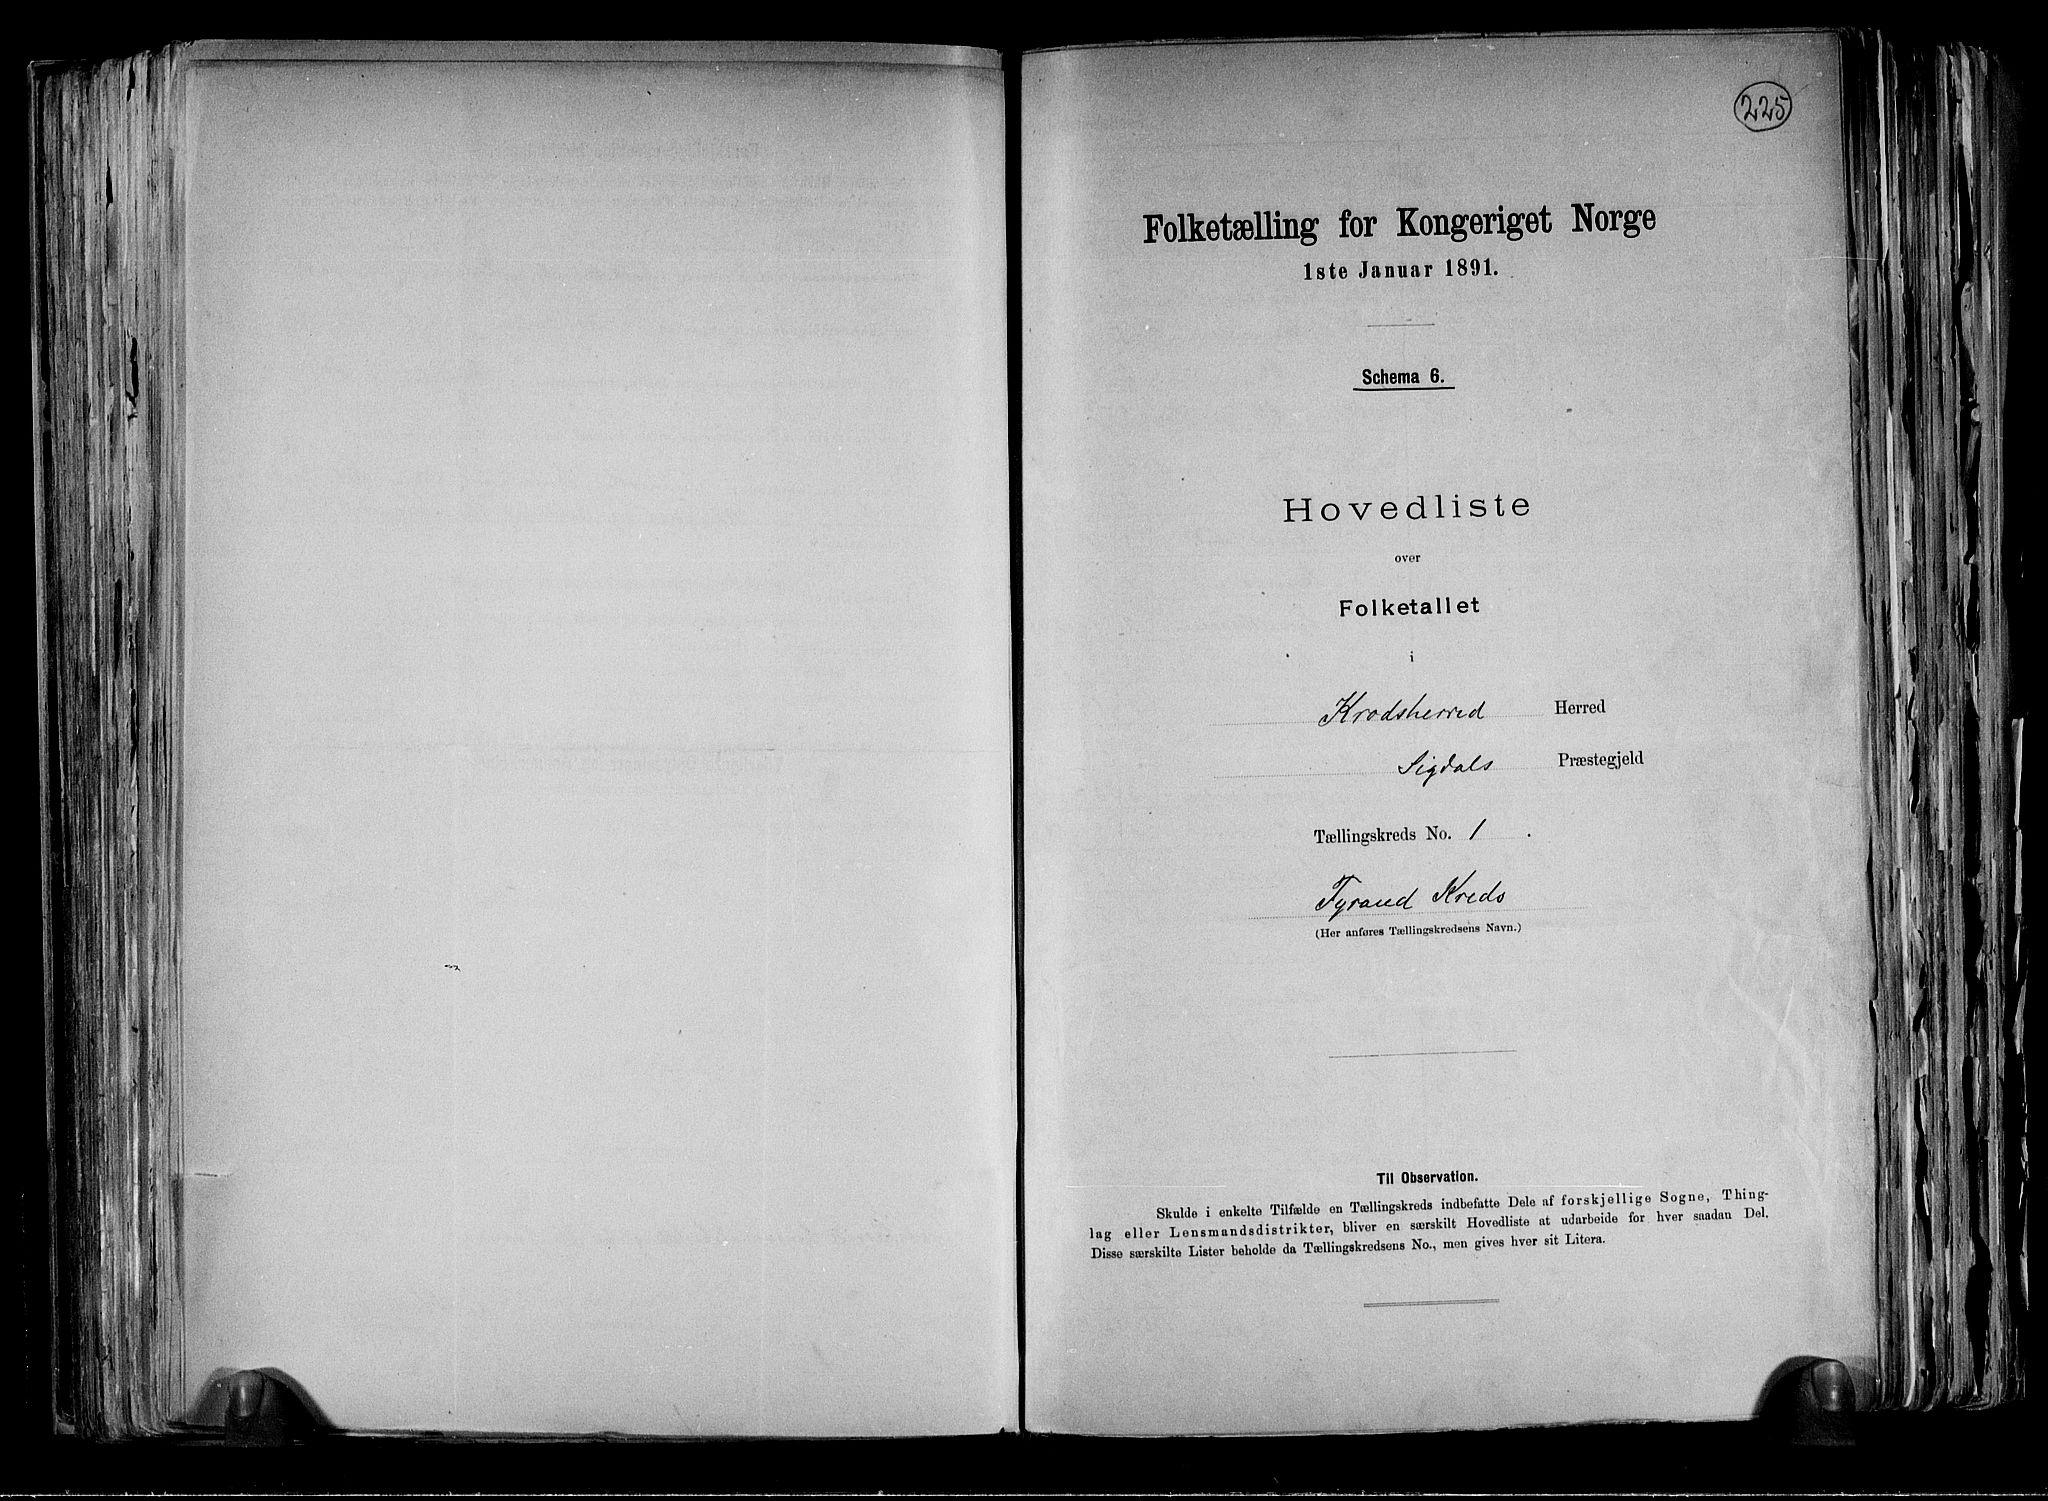 RA, Folketelling 1891 for 0621 Sigdal herred, 1891, s. 38